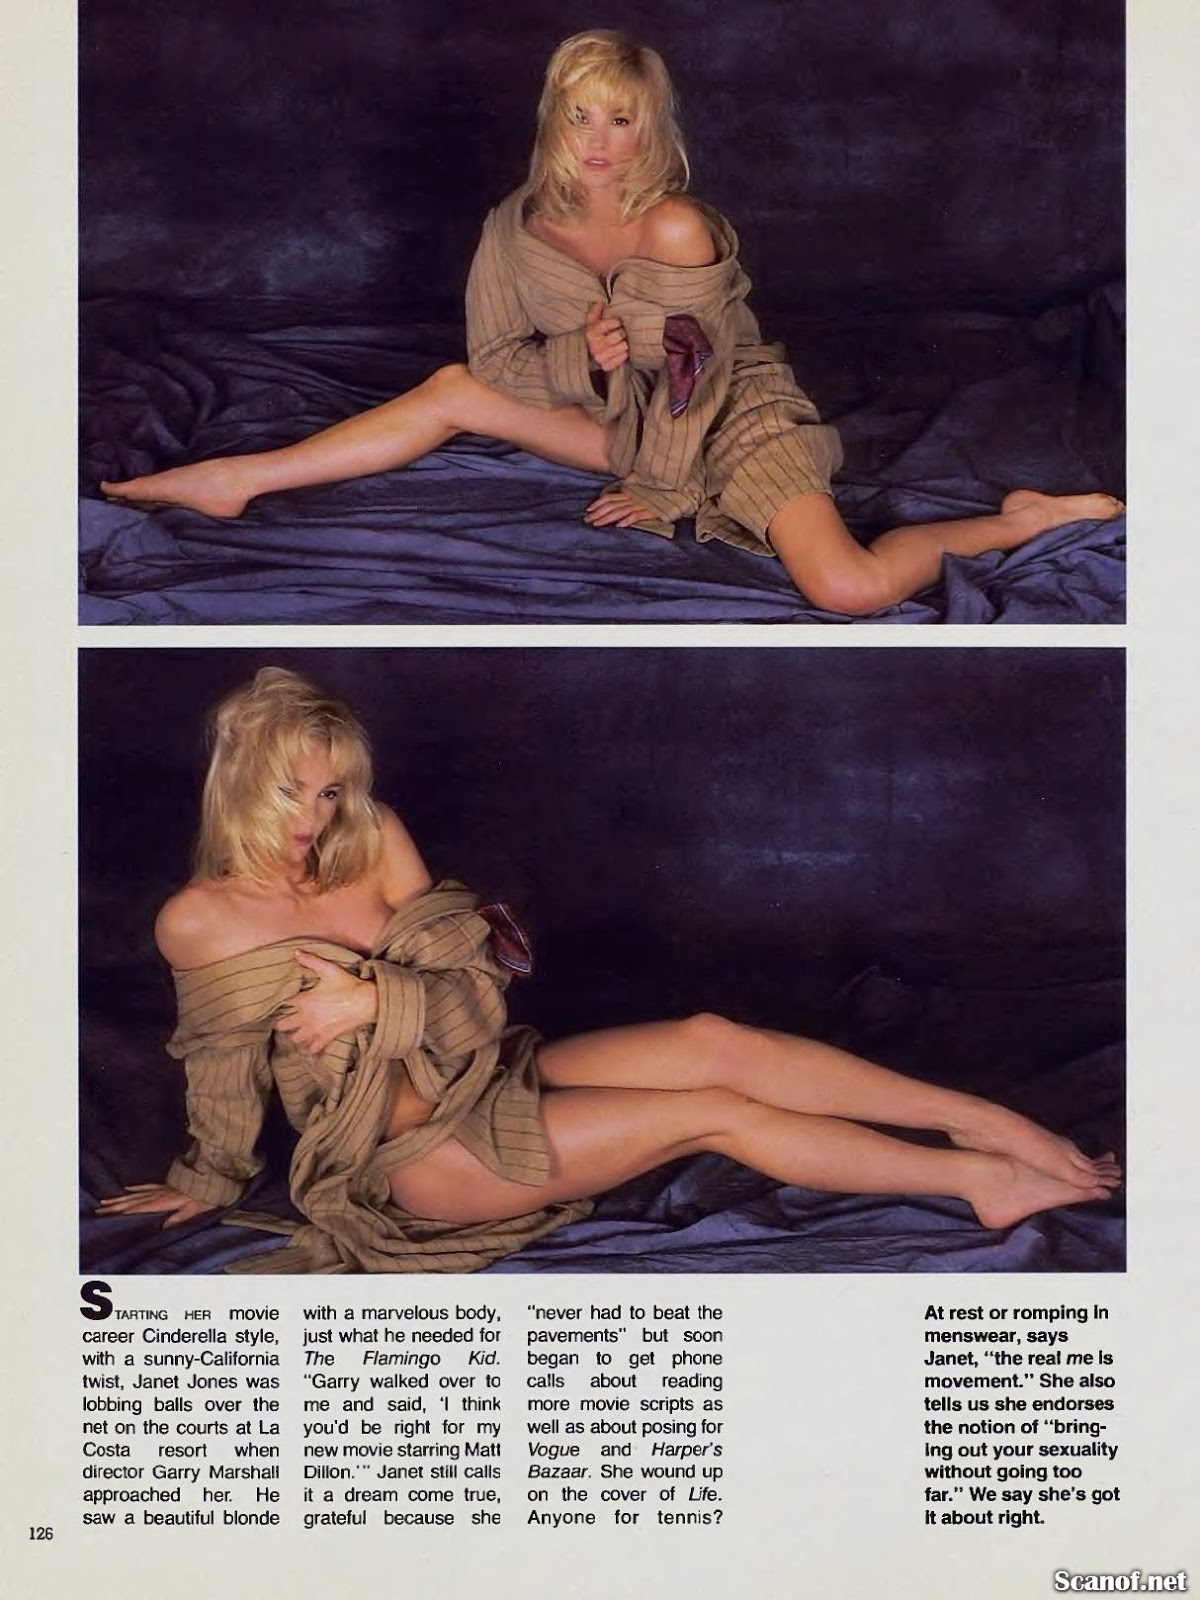 Playboy September 1987 Issue - Hot Girls Wallpaper